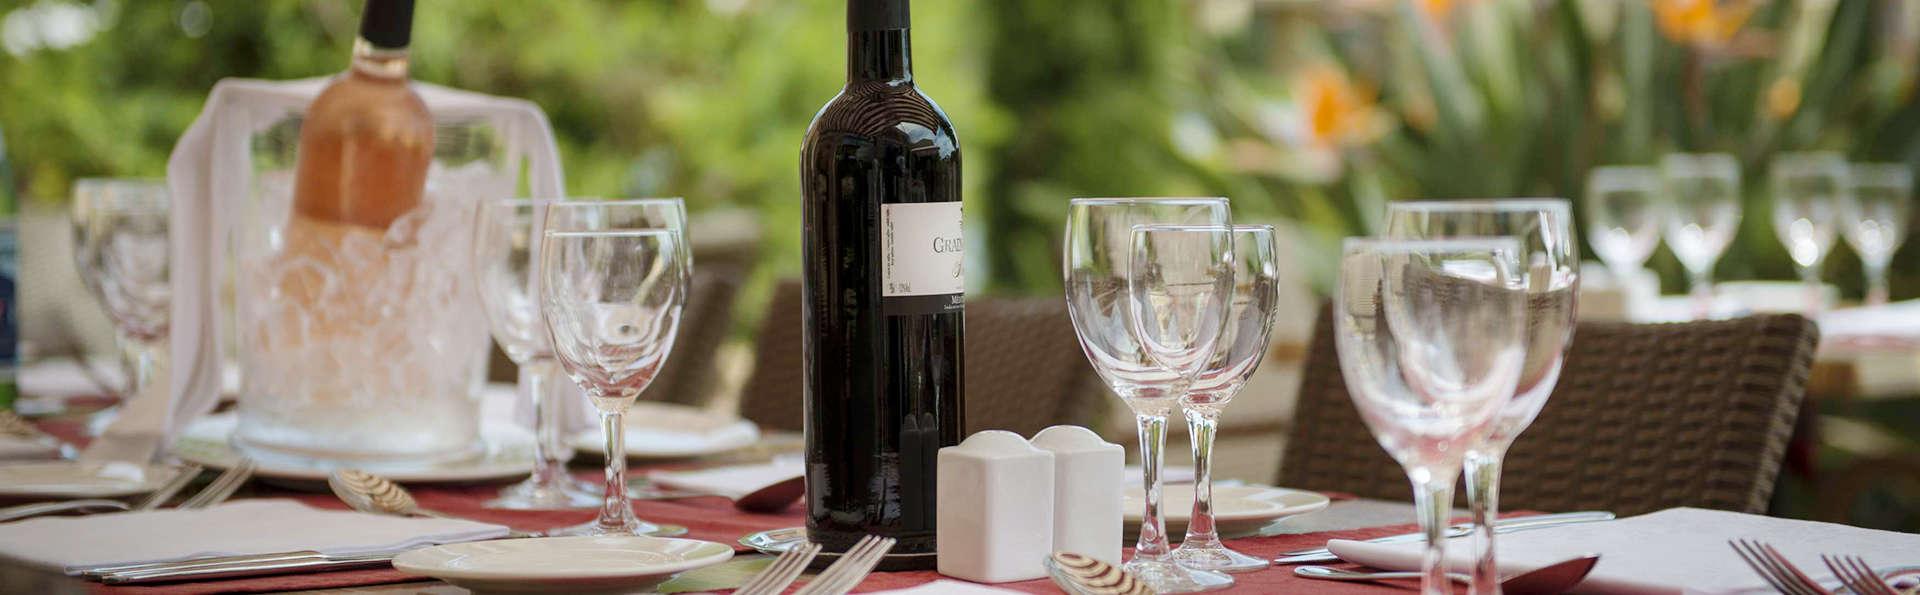 Week-end gourmand avec dîner 3 plats à Sainte-Maxime